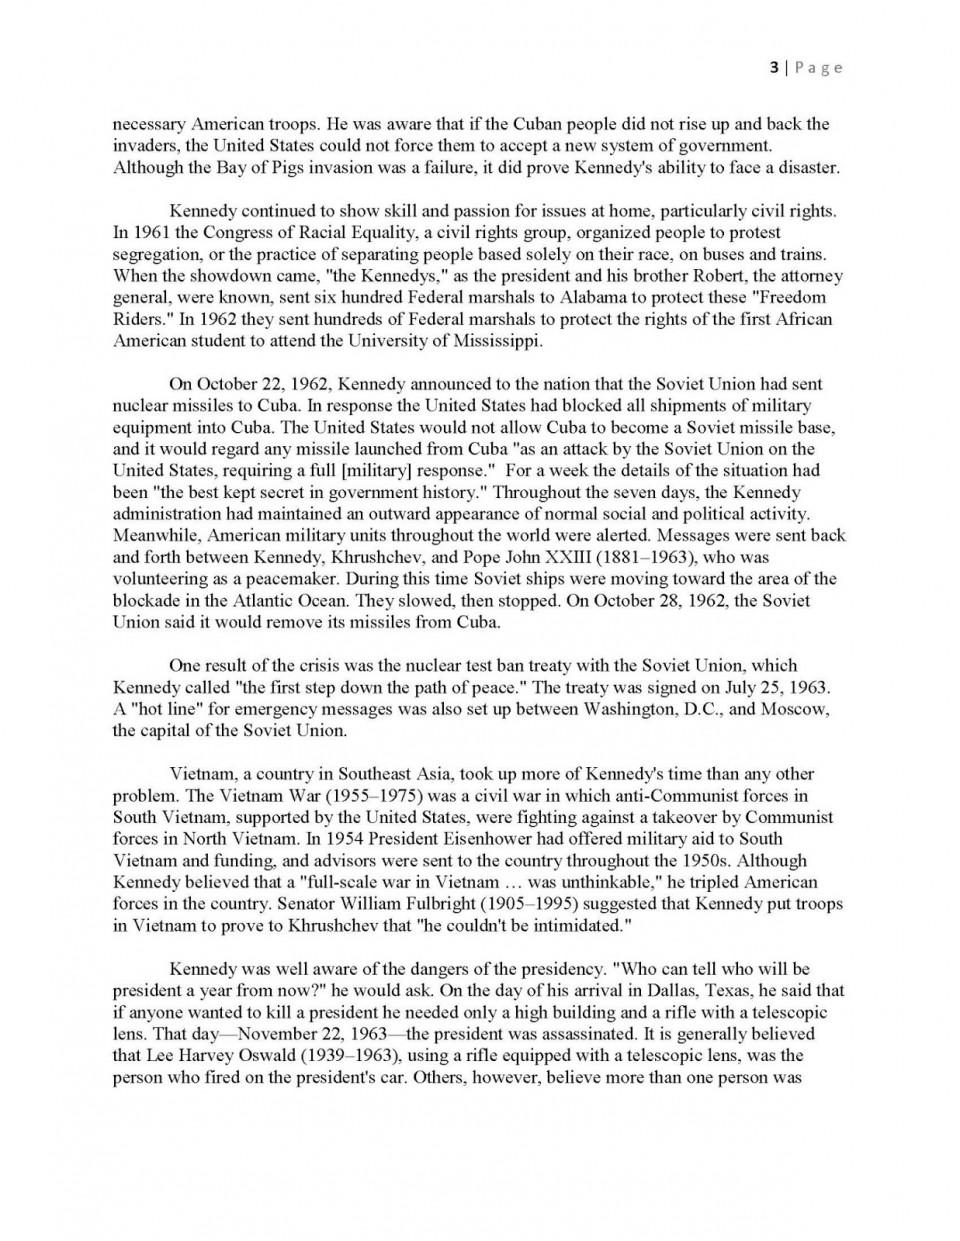 010 Essay Example Interview Jfkmlashortformbiographyreportexample Page 3 Shocking Examples Mla Format Profile Apa 960